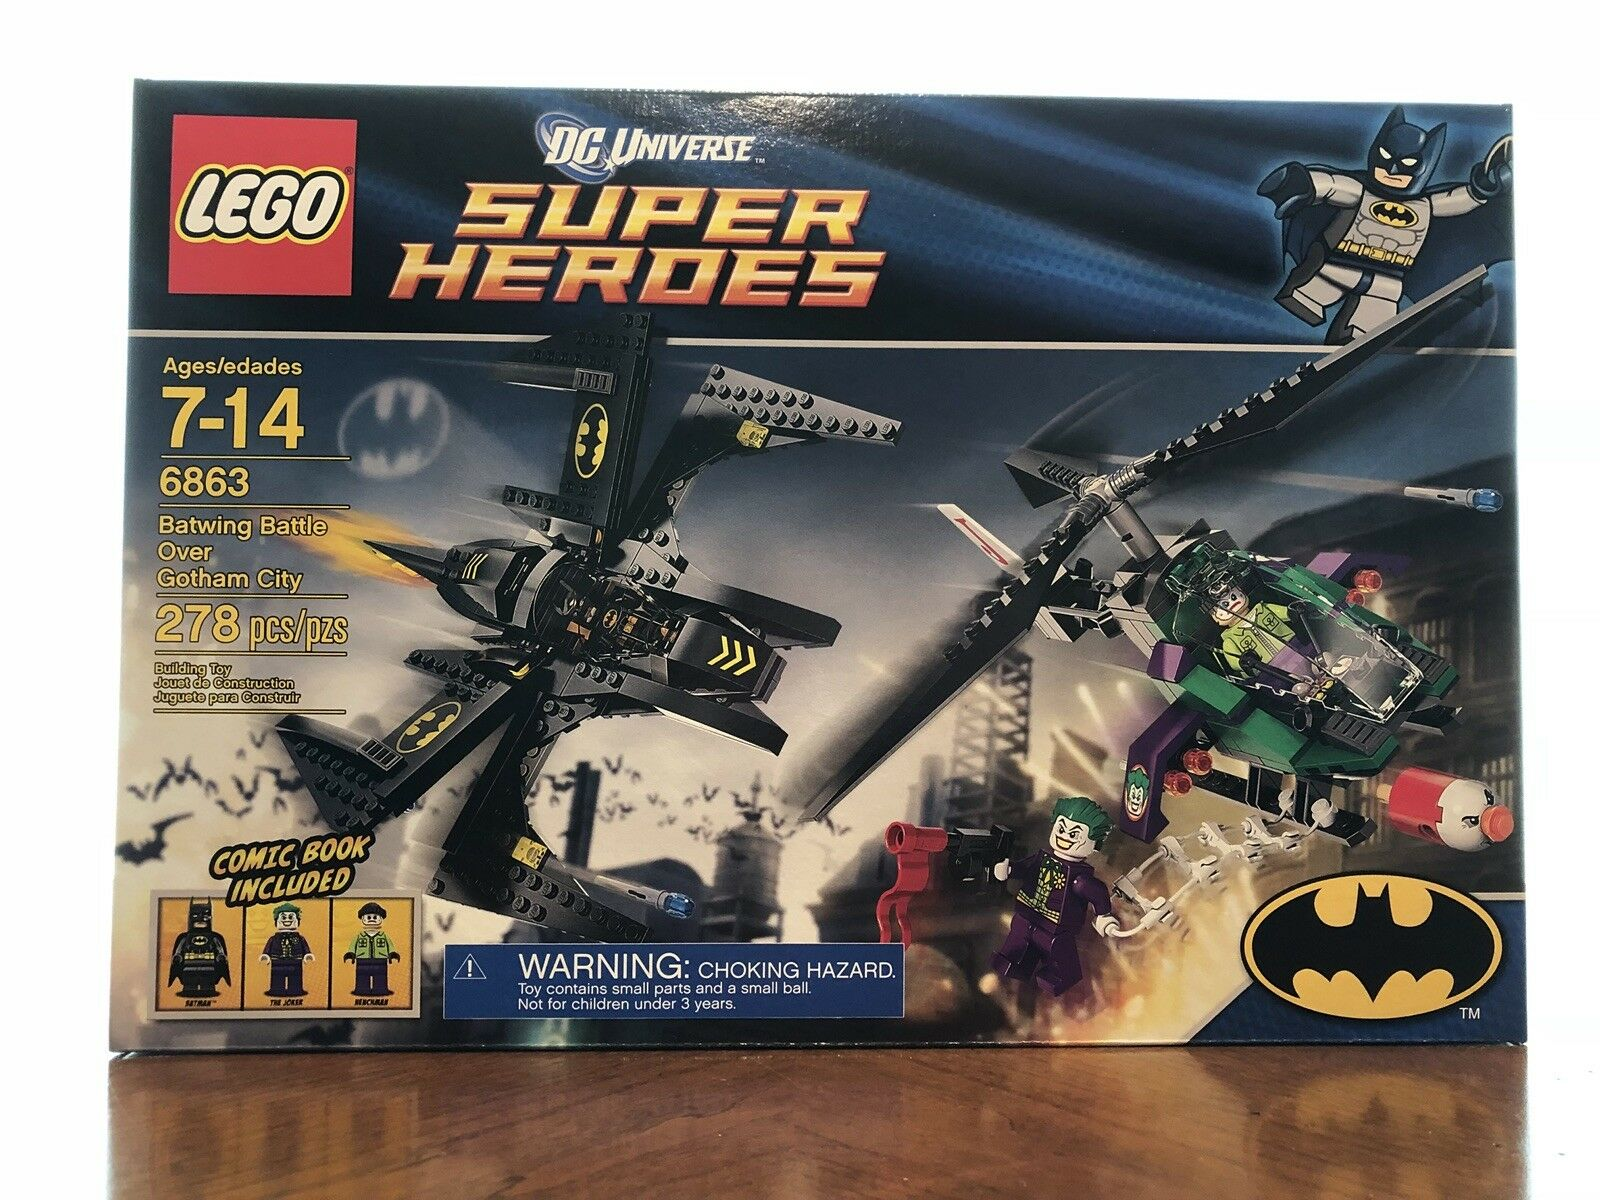 Sconto del 70% a buon mercato LEGO 6863 DCUniverse Super Heroes-Batwing Battle Over Gotham città città città (Discontinued)  vendita calda online